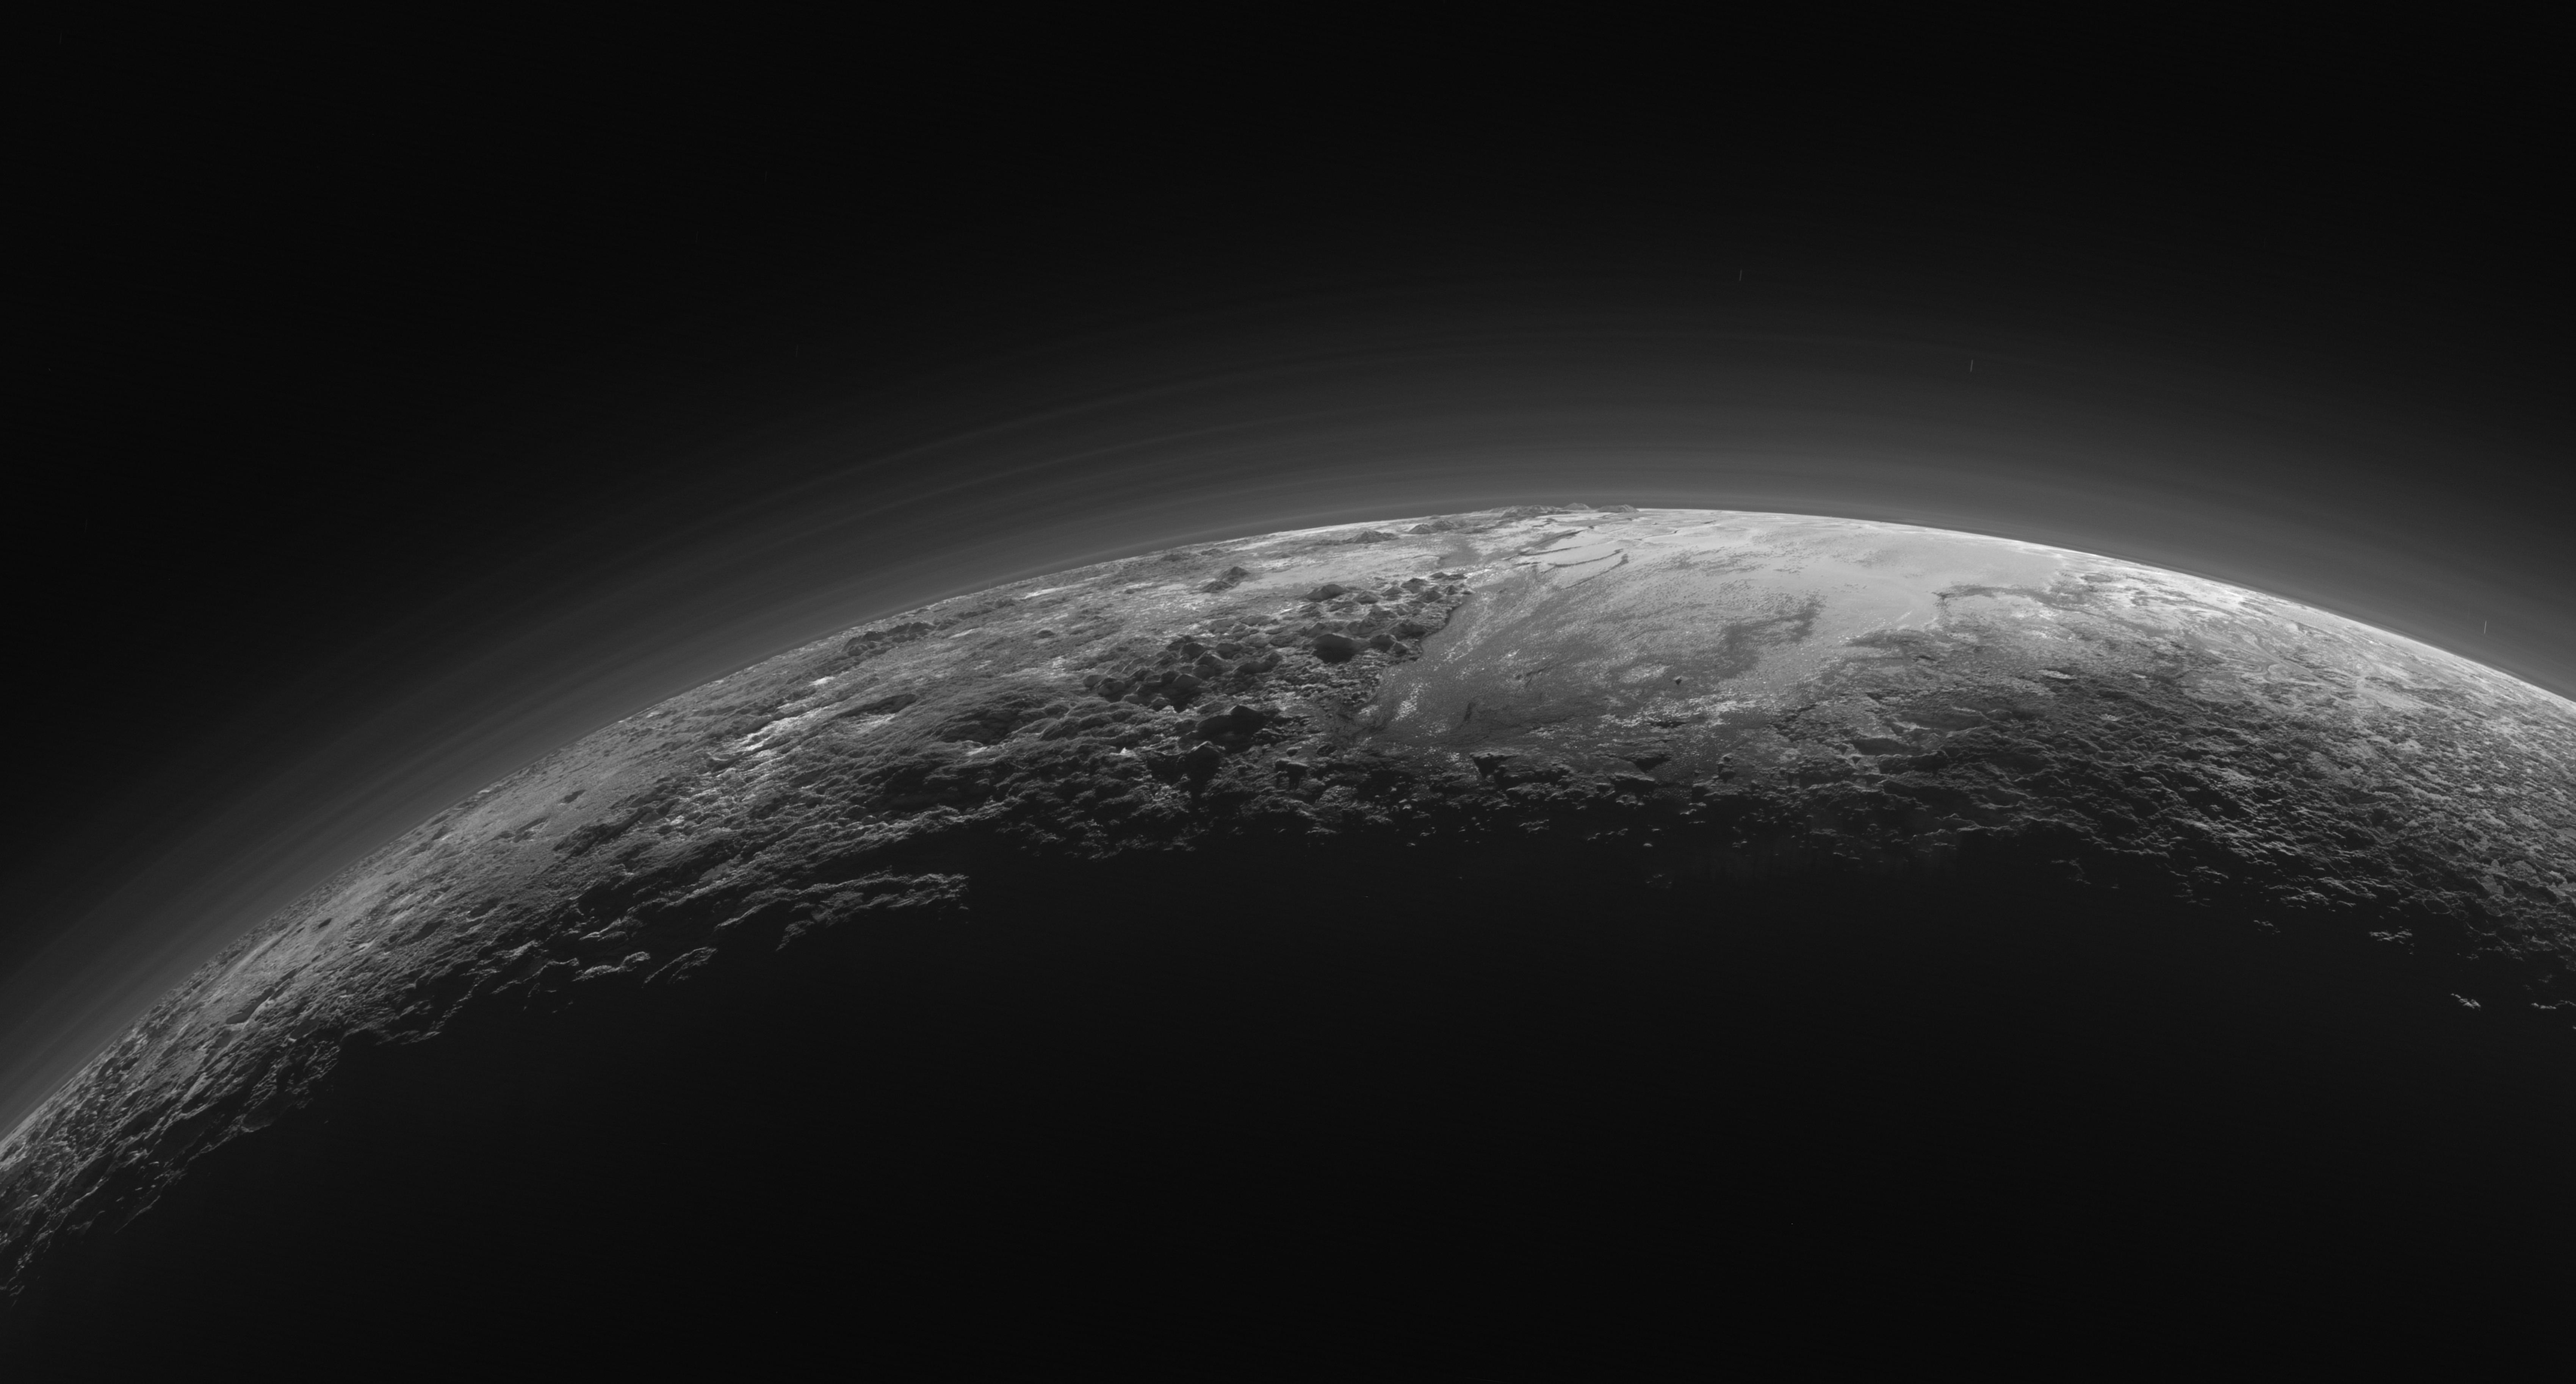 Pluto HD wallpapers, Desktop wallpaper - most viewed